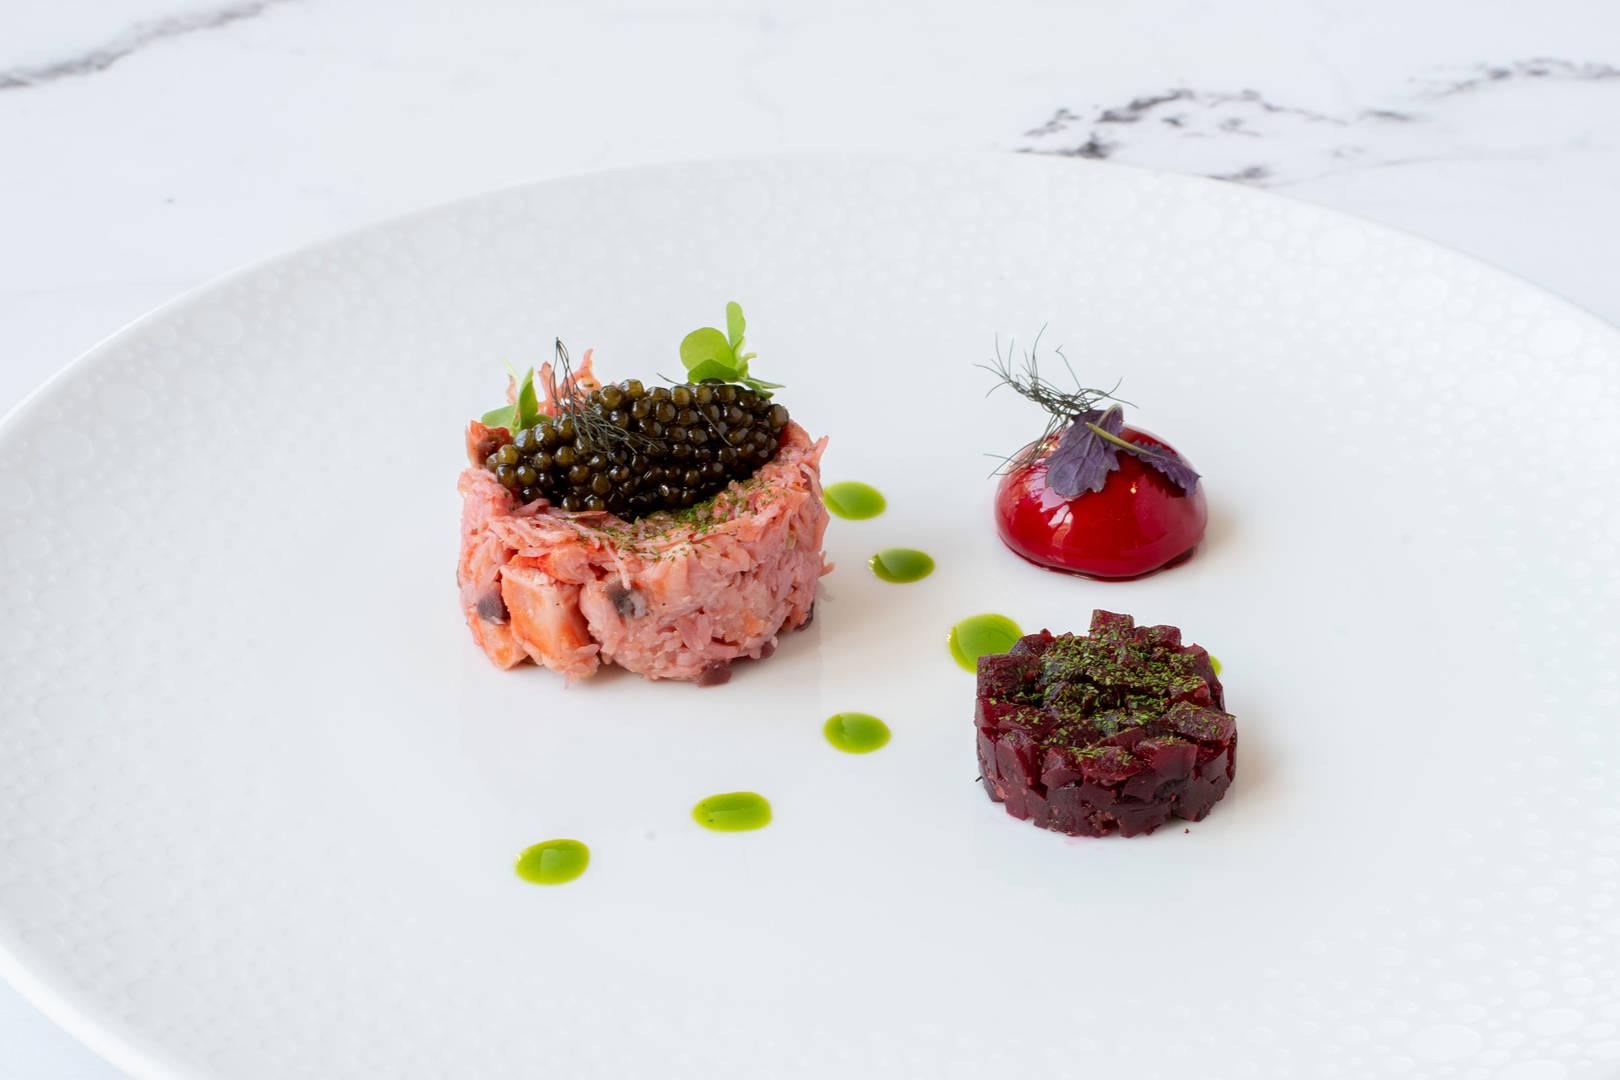 https://cdn.jumeirah.com/-/mediadh/DH/Hospitality/Jumeirah/Restaurants/Frankfurt/Frankfurt-Max-On-One-Grill-Room/Restaurant-Gallery/Jumeirah-Frankfurt-Starter-6-4.jpg?h=1080&w=1620&hash=433EB55EF70D0729A7EFB1896D8FA55E